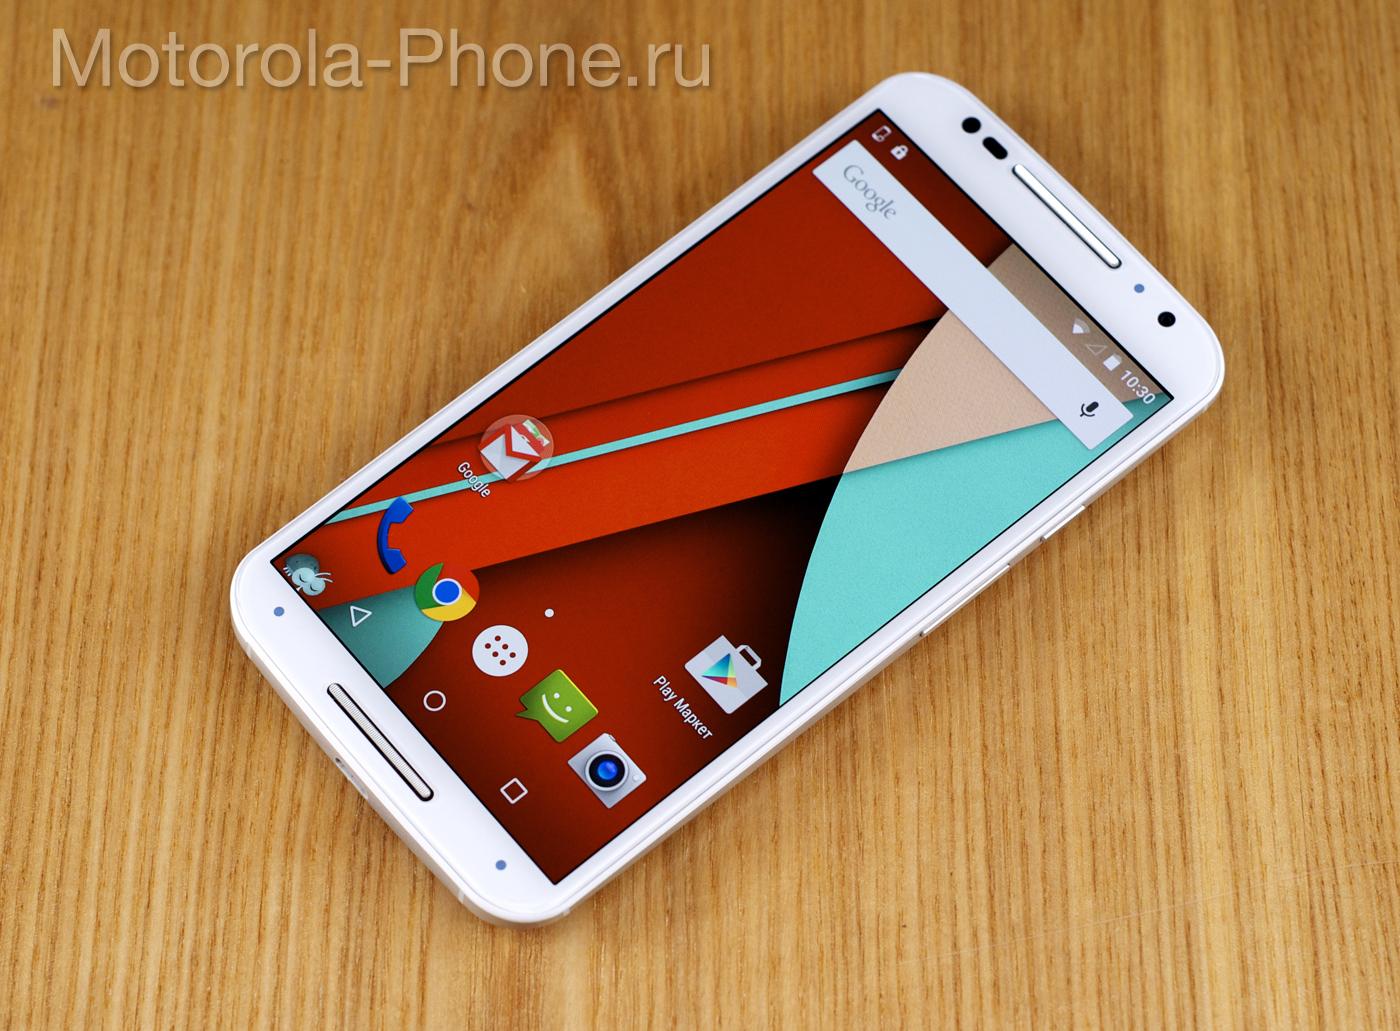 Motorola-Moto-X-review-01